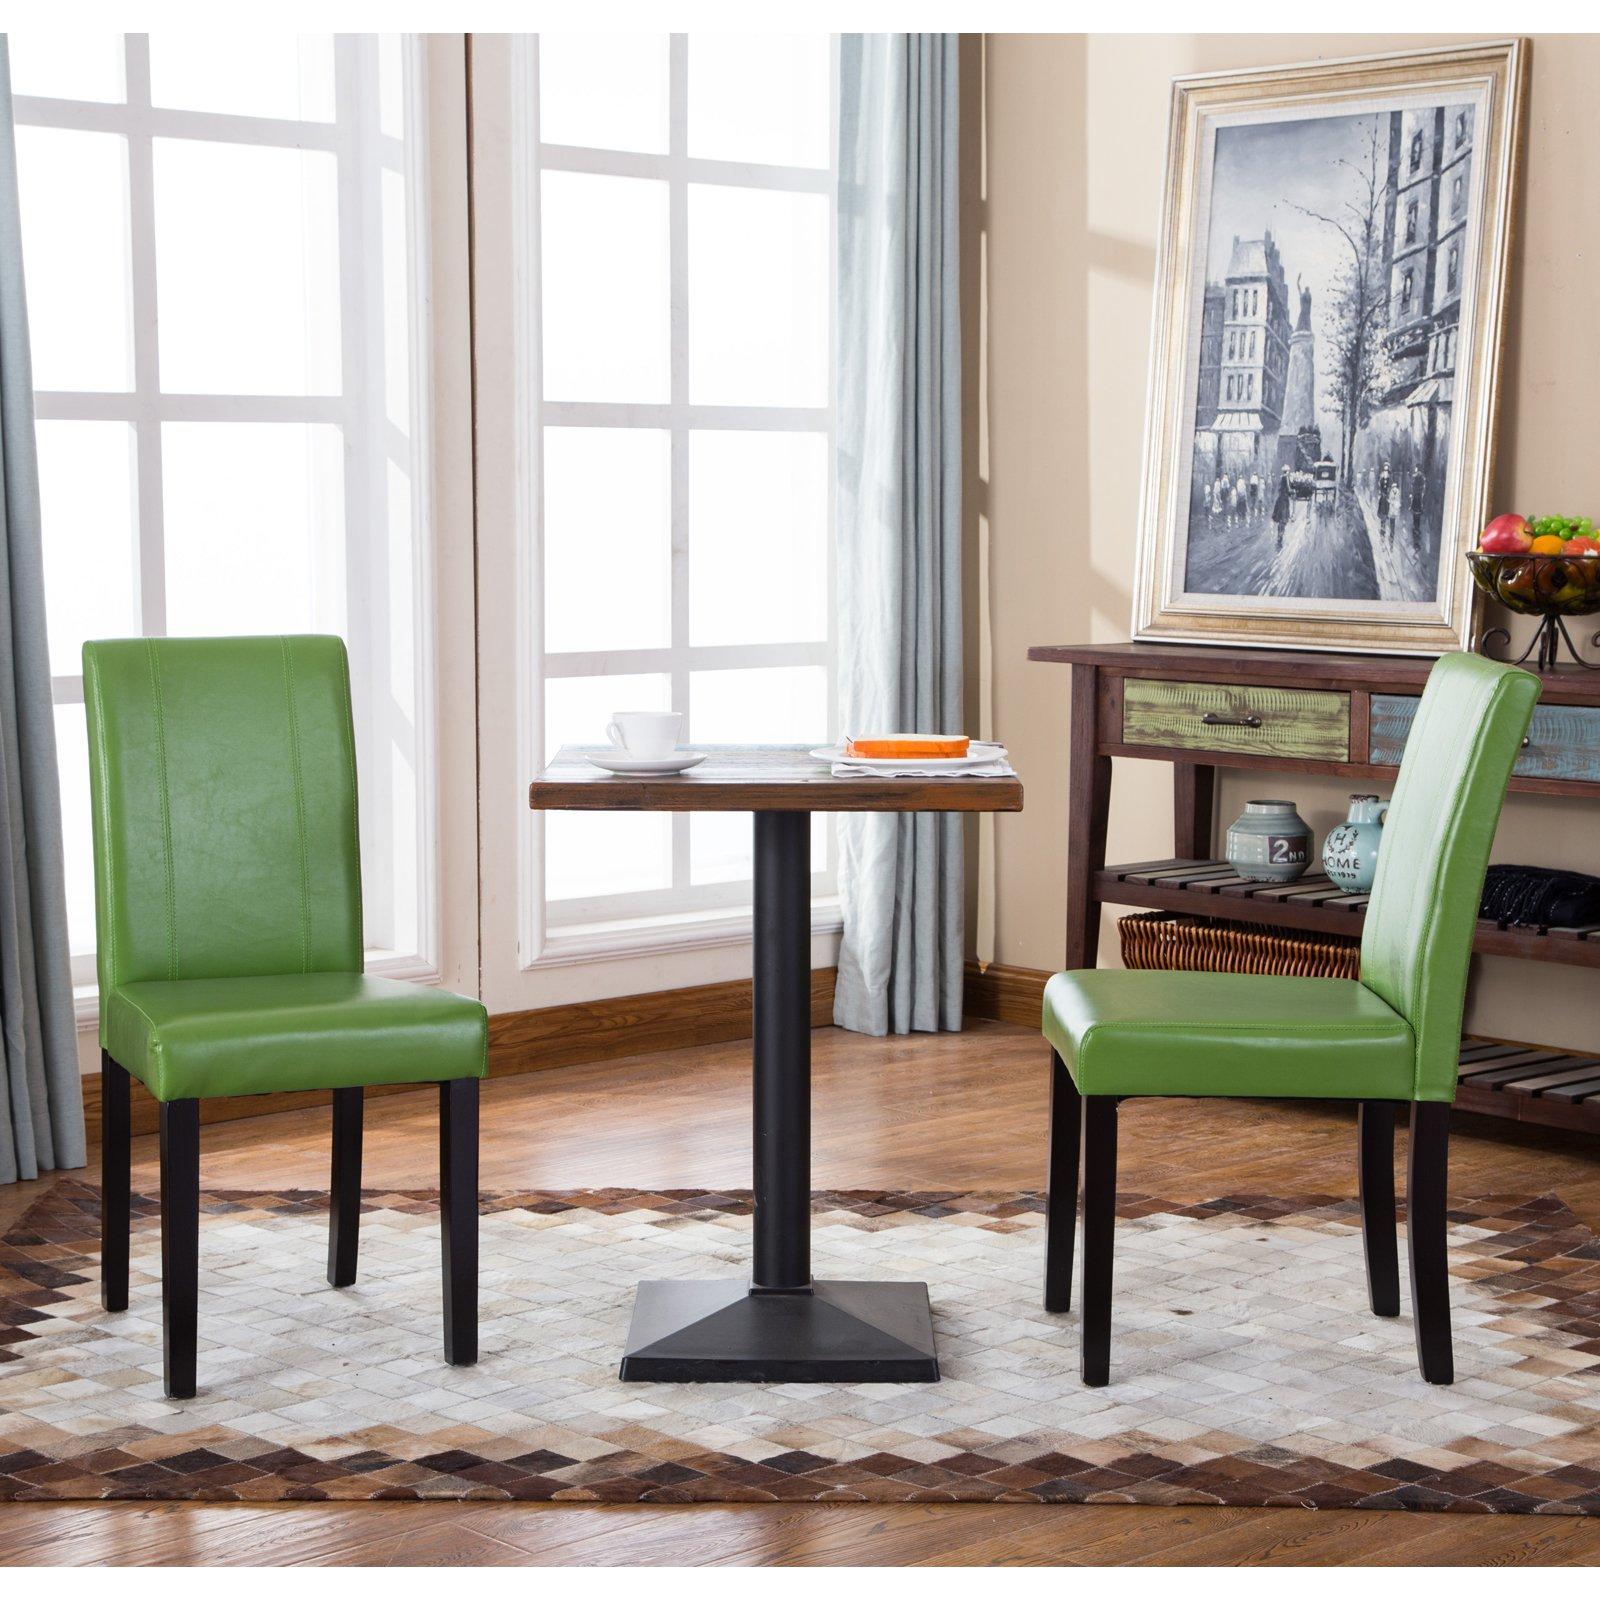 Roundhill Furniture Urban Parson Chair (Set of 2)